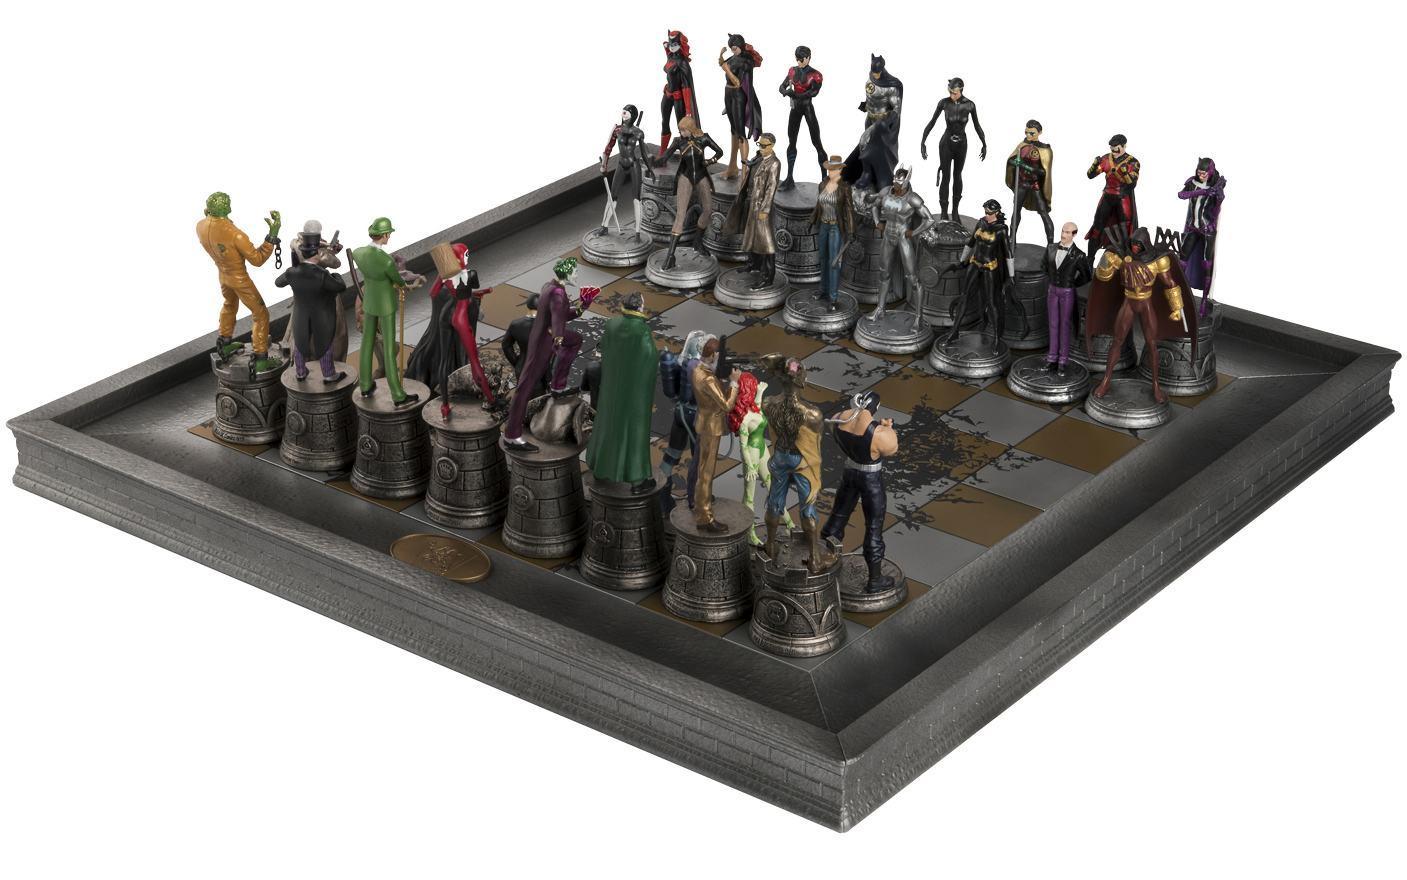 Xadrez-Eaglemoss-DC-Comics-Complete-Batman-Chess-Set-04